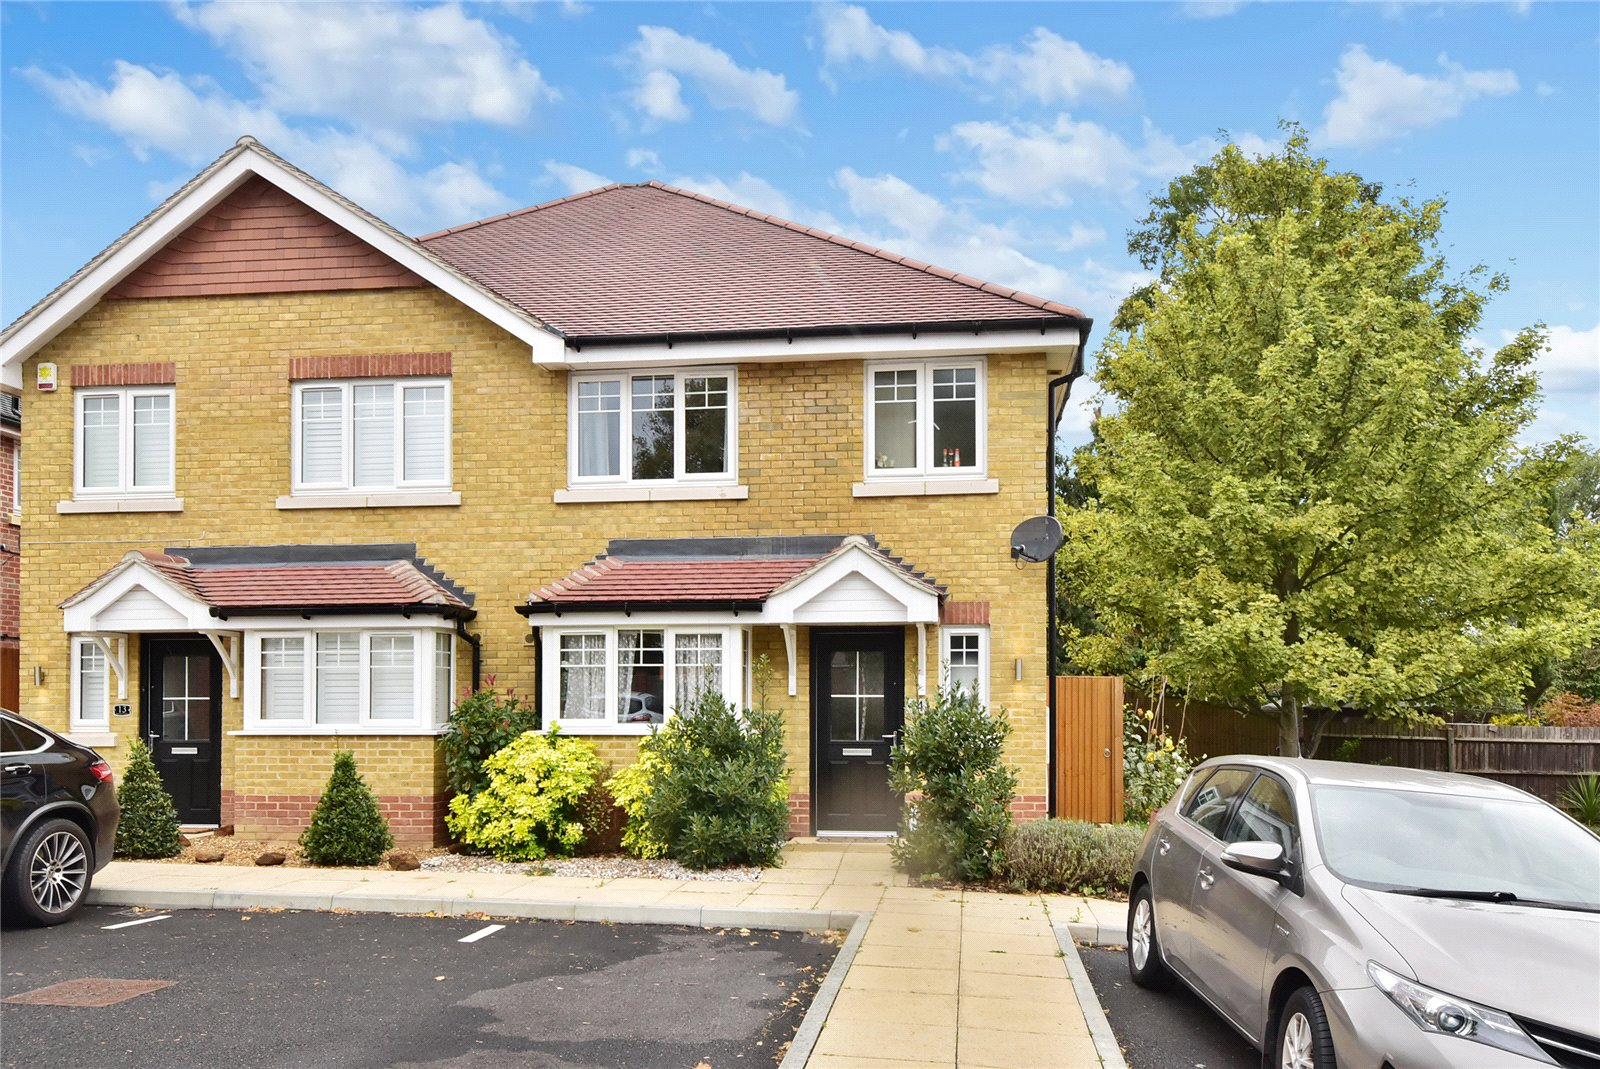 Western Terrace, Havelock Gate, West Dartford, Kent, DA1